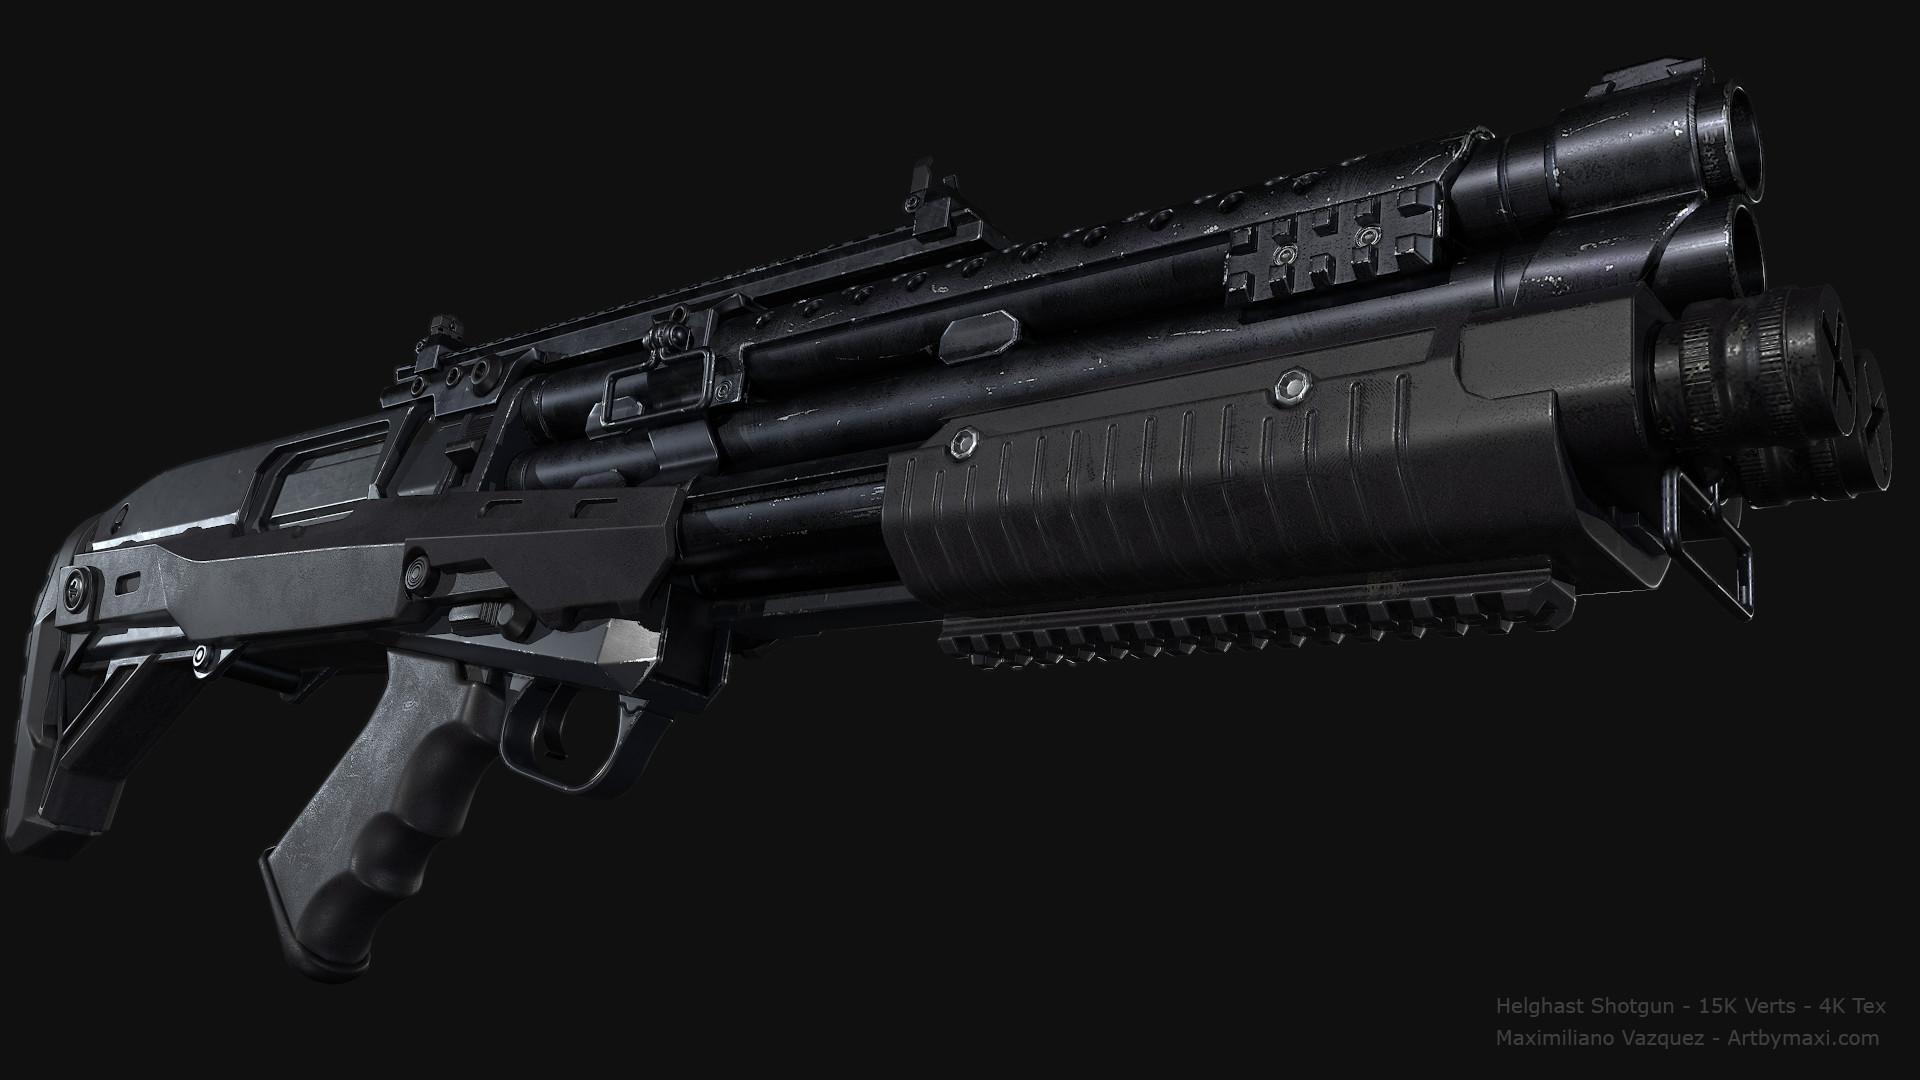 Maximiliano vazquez hellghast shotgun lp6